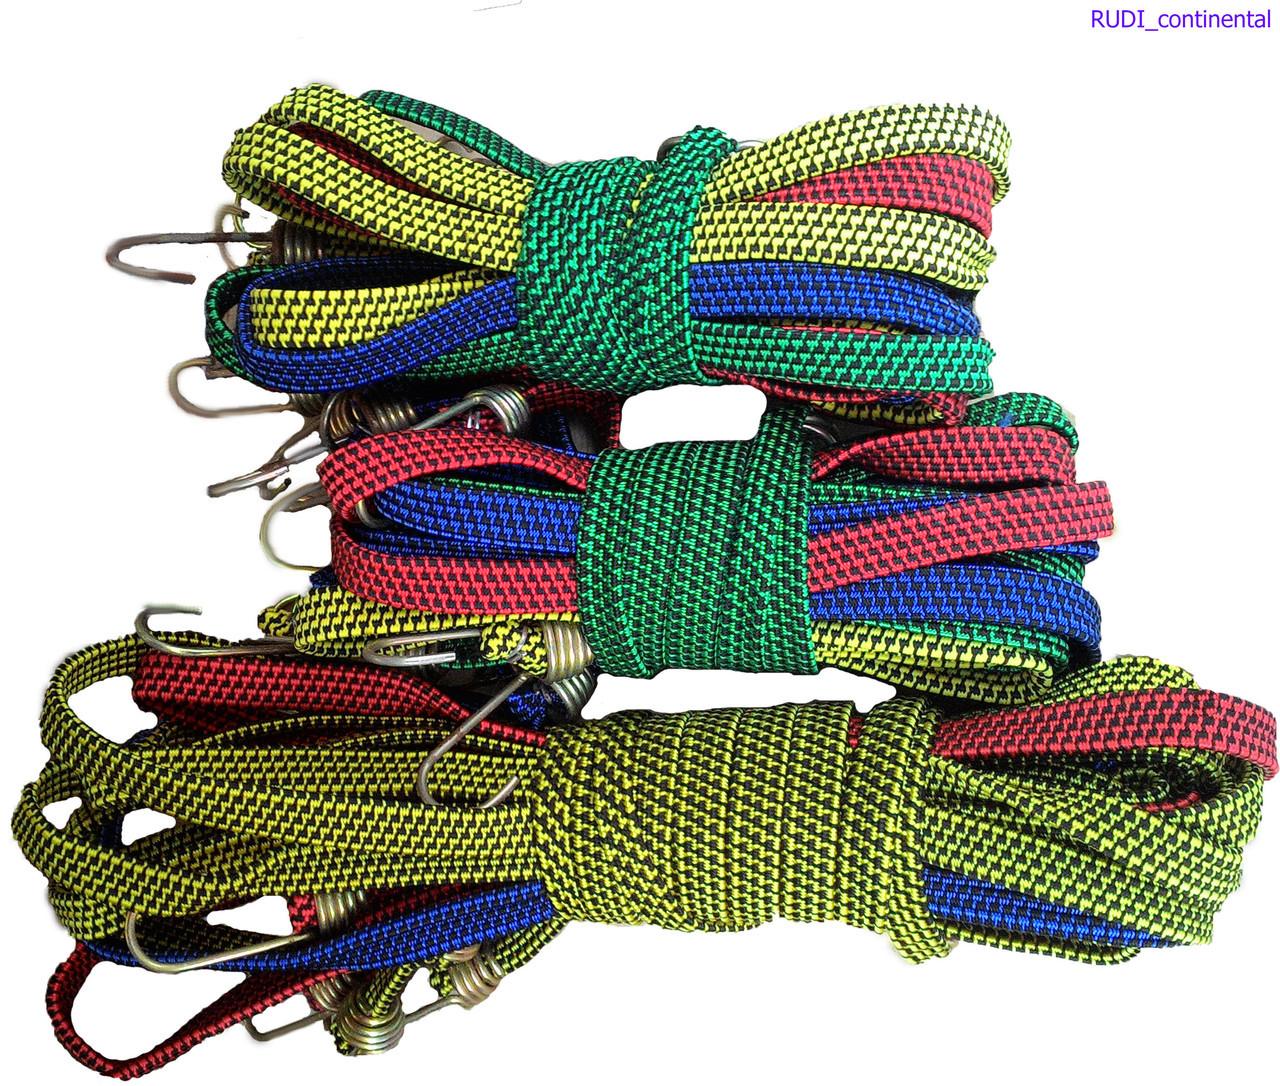 Резинка багажная с крючками  1.5 м х 20 мм (10 шт/упак) цветная плоская